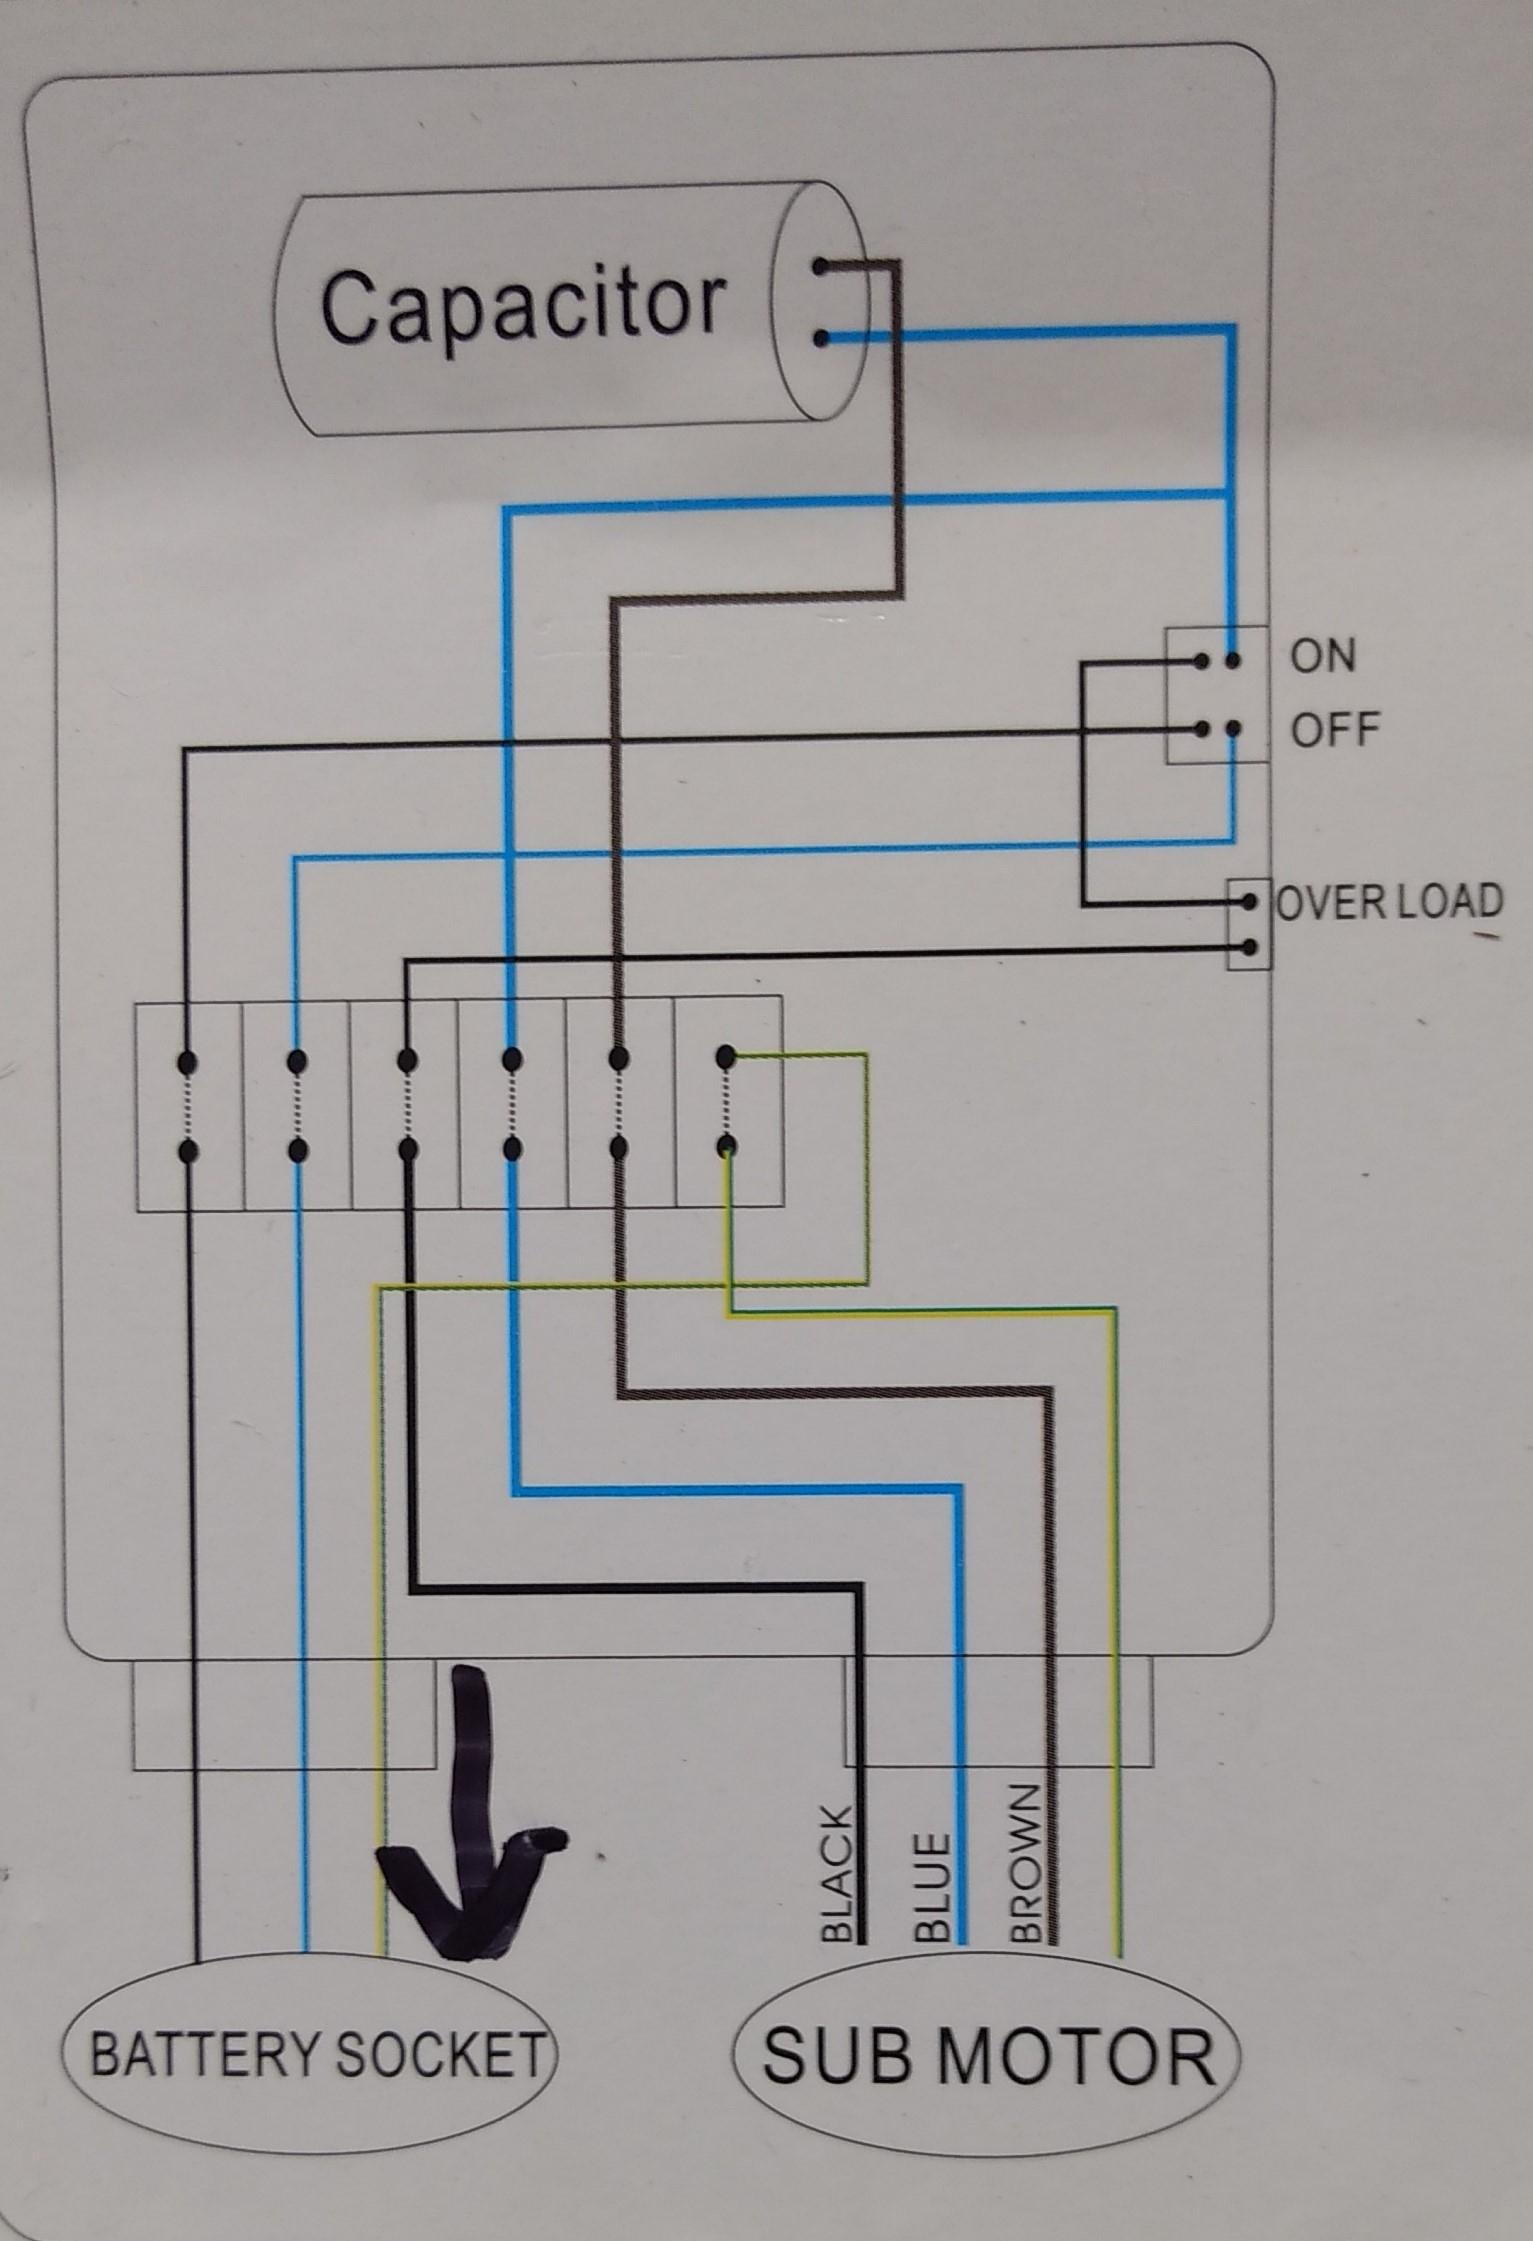 Control Box Wiring - Wiring Diagram Data Oreo - Well Pump Control Box Wiring Diagram